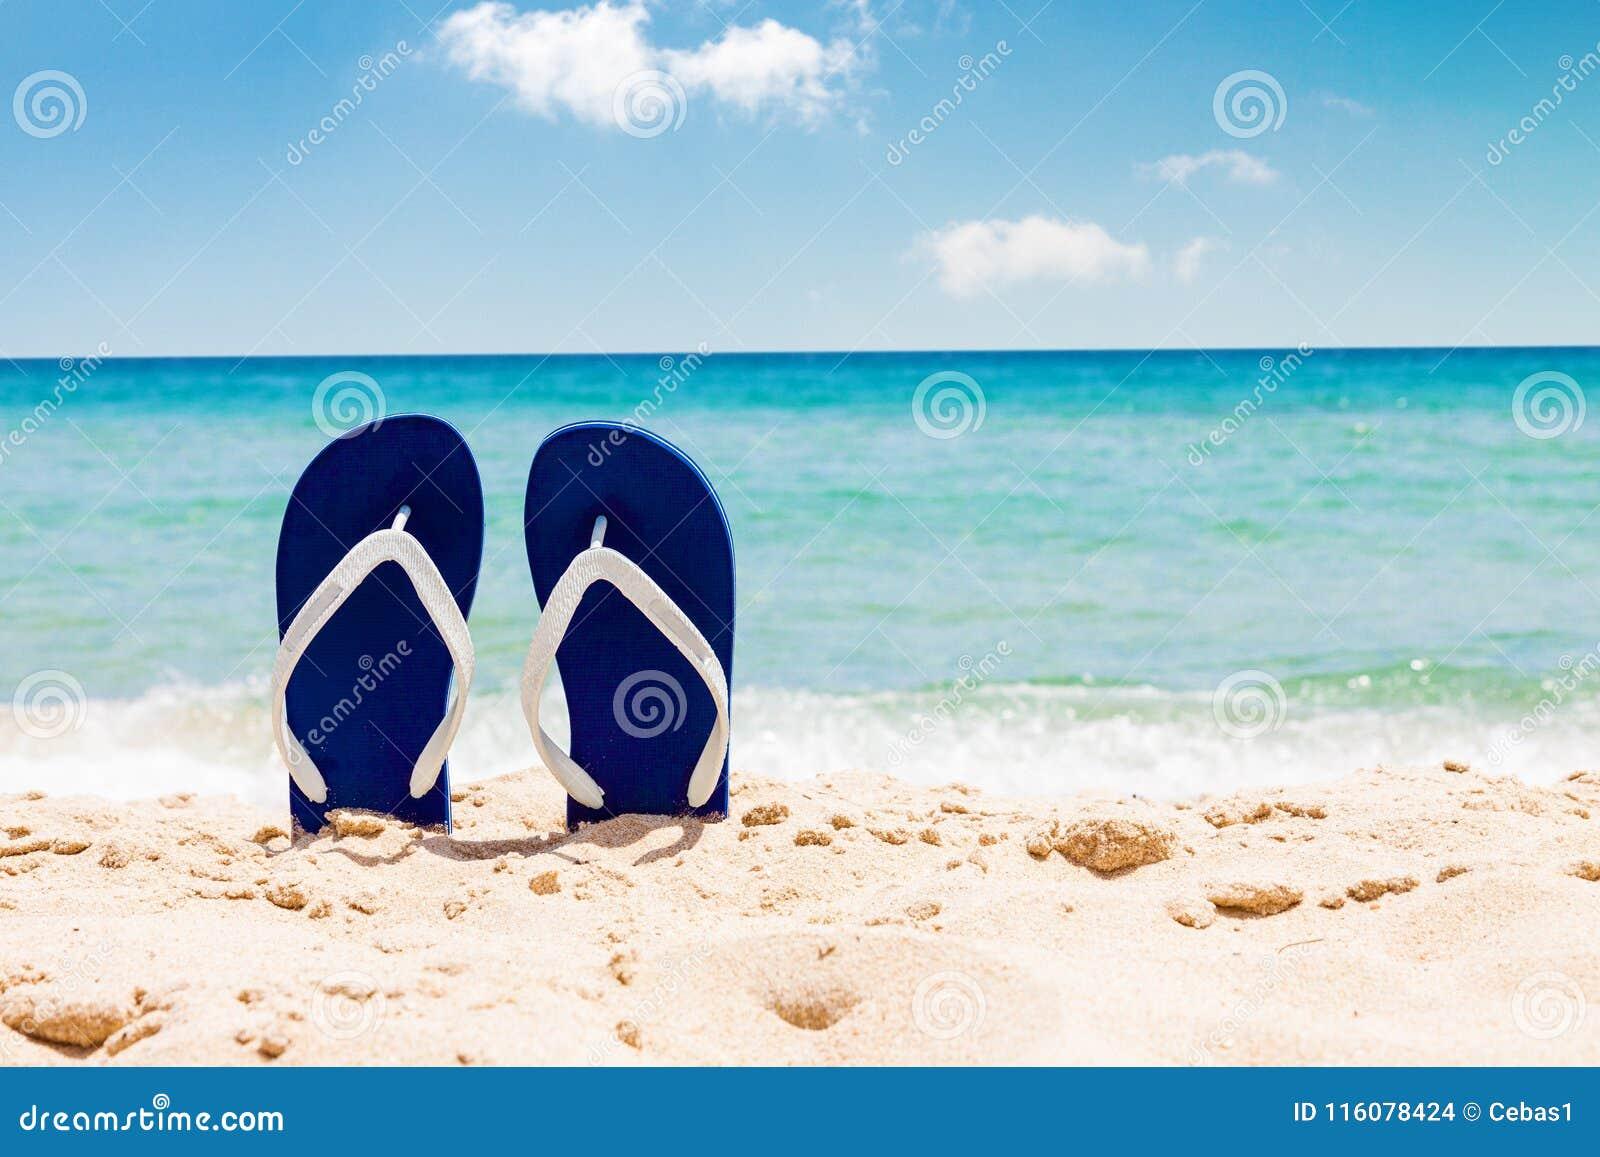 Pair of flip flops on tropical sand beach in summer